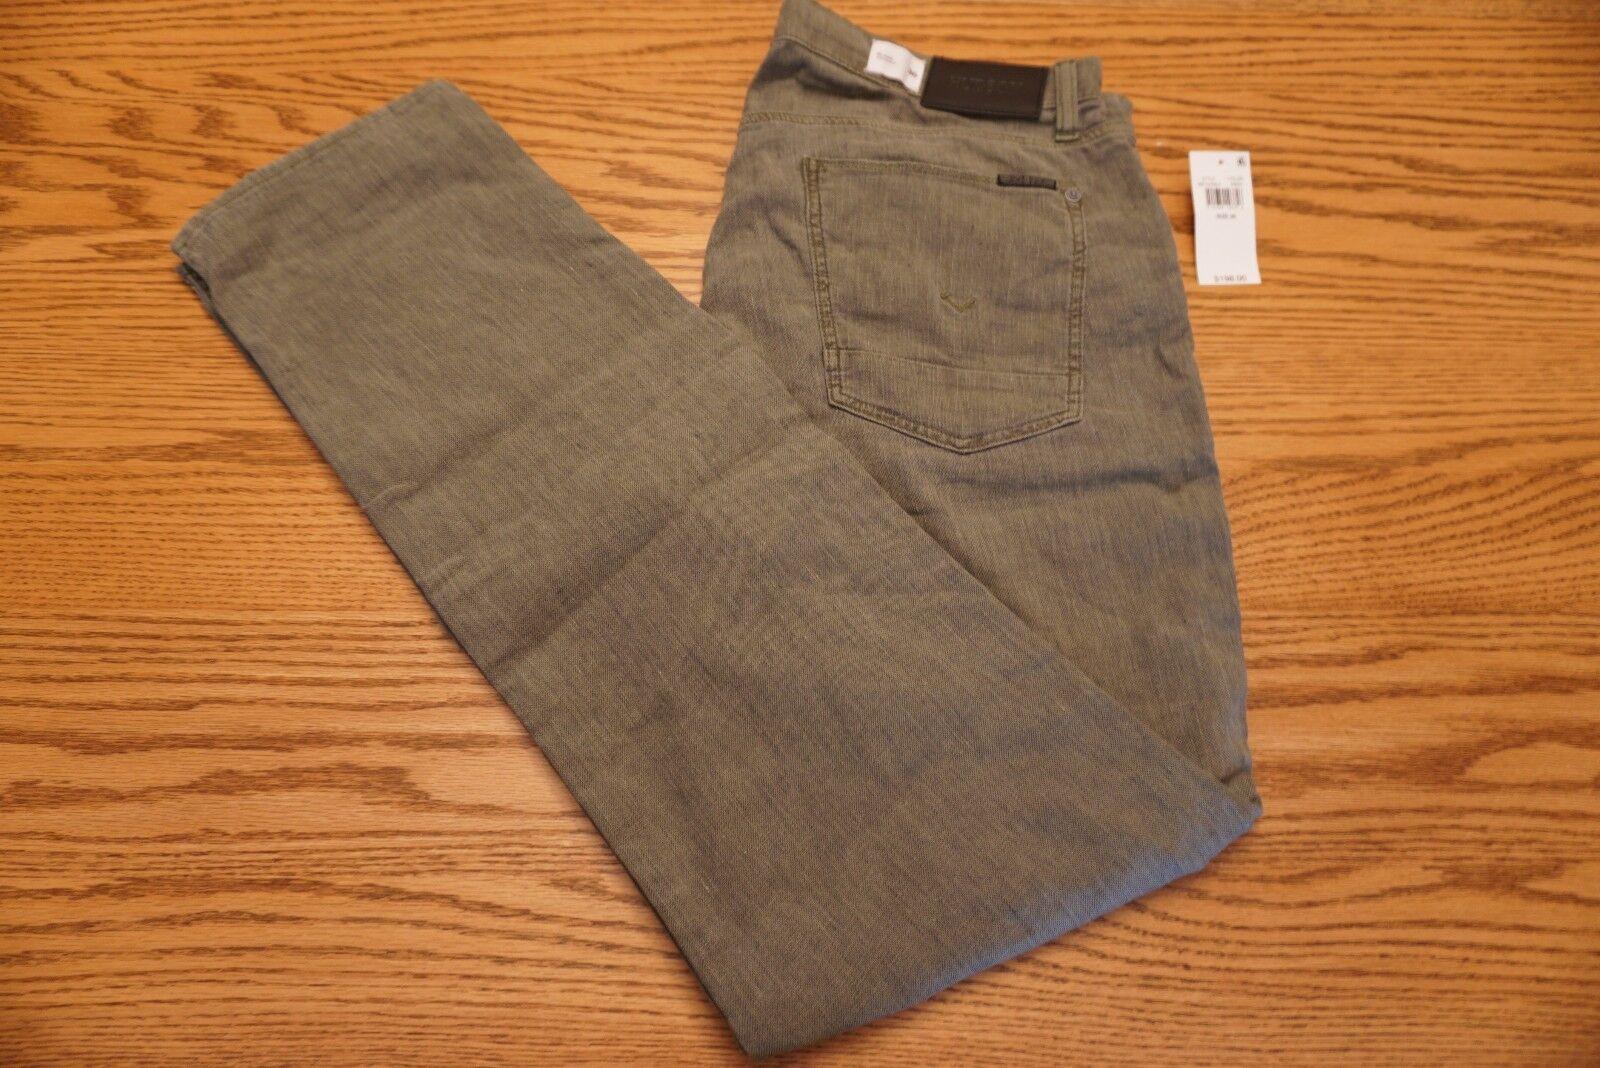 NWT MEN'S HUDSON JEANS PANTS Size 36 x 33 Blake Slim Straight Linen Hunter